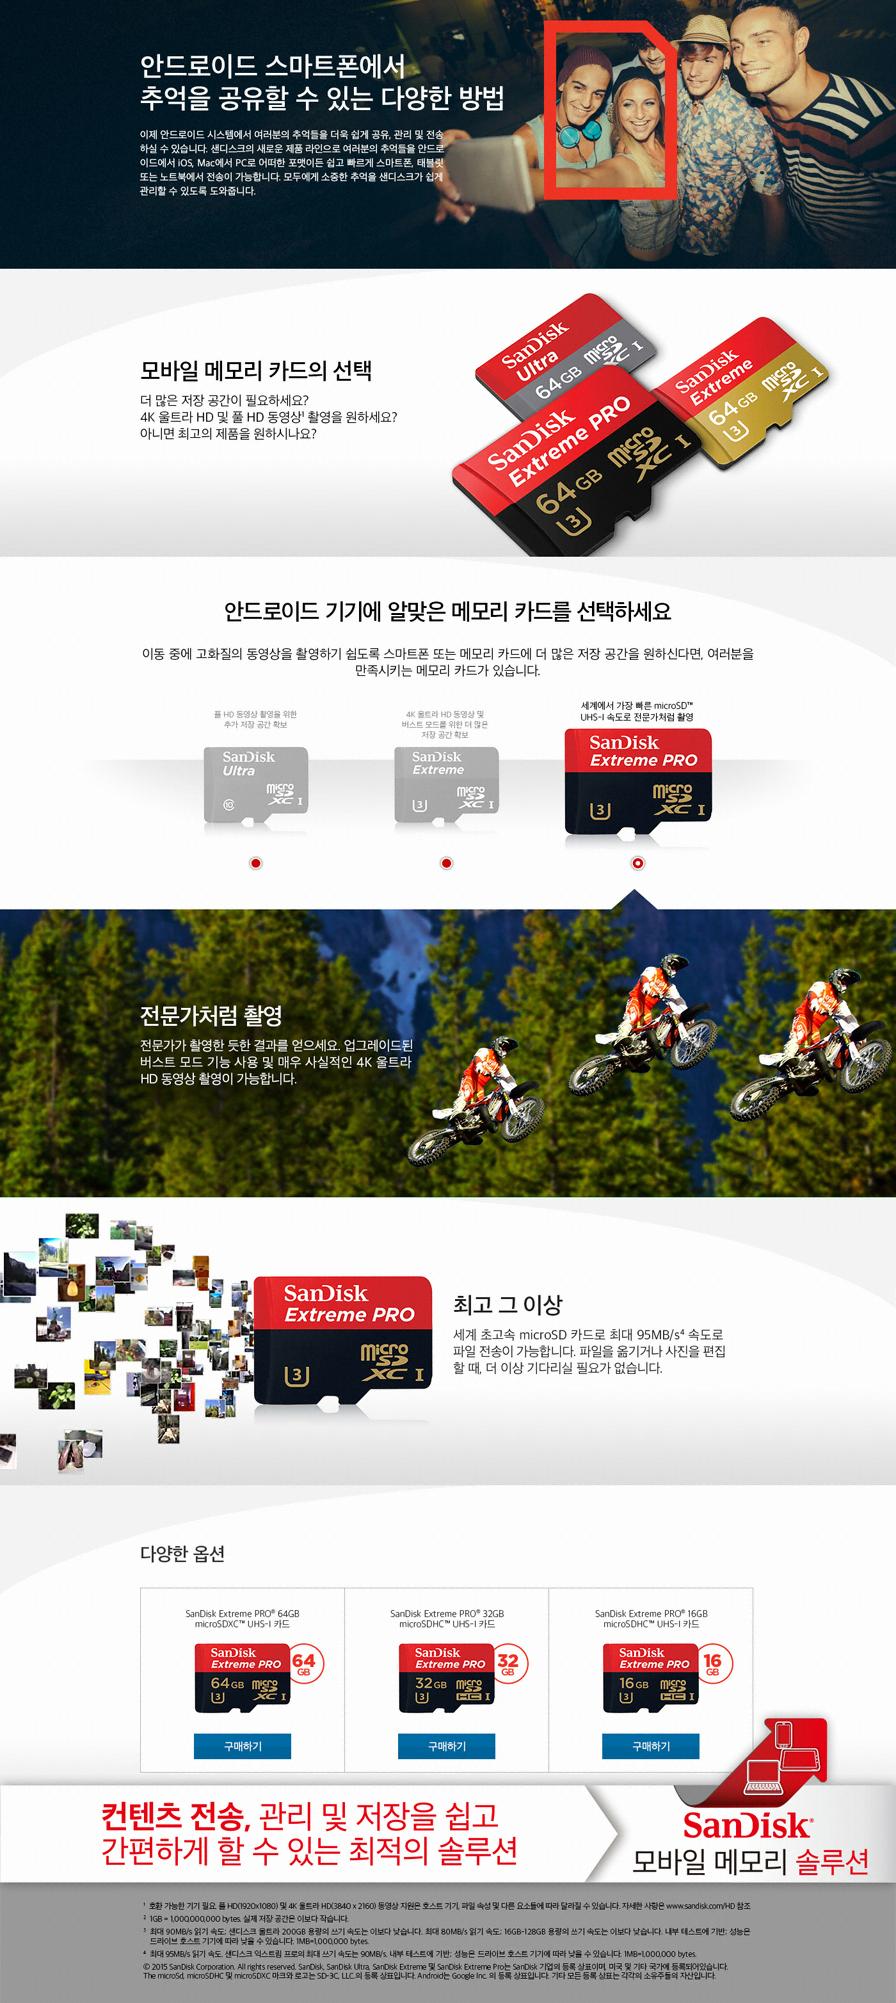 Sandisk micro SDHC CLASS10 UHS-I U3 Extreme Pro V30 (32GB)